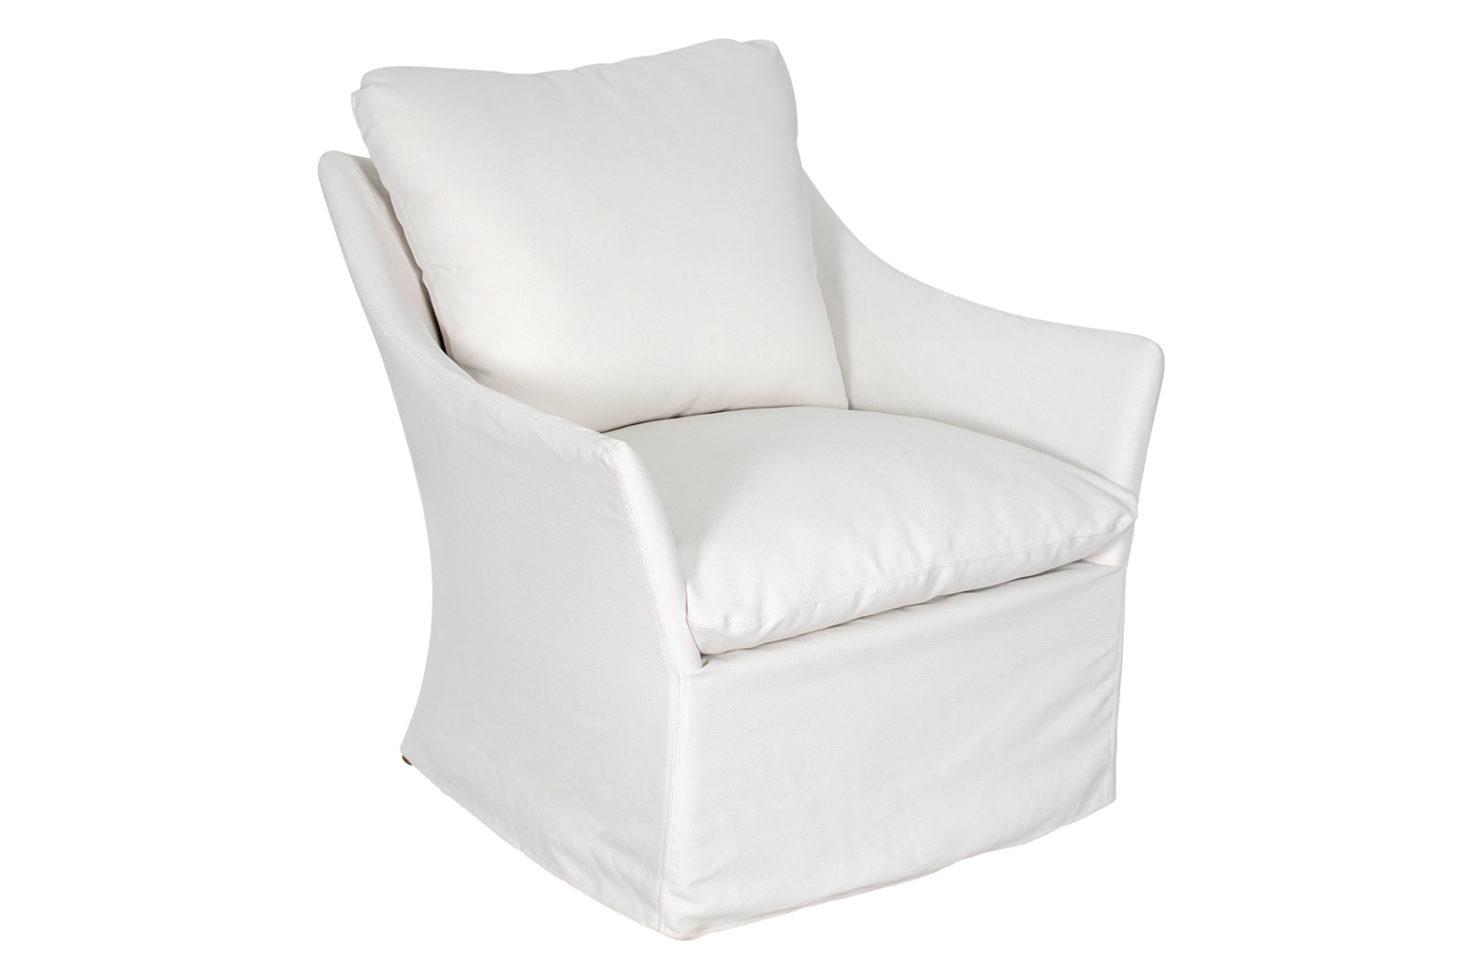 capri lounge 620FT091FC GW 1 3Q